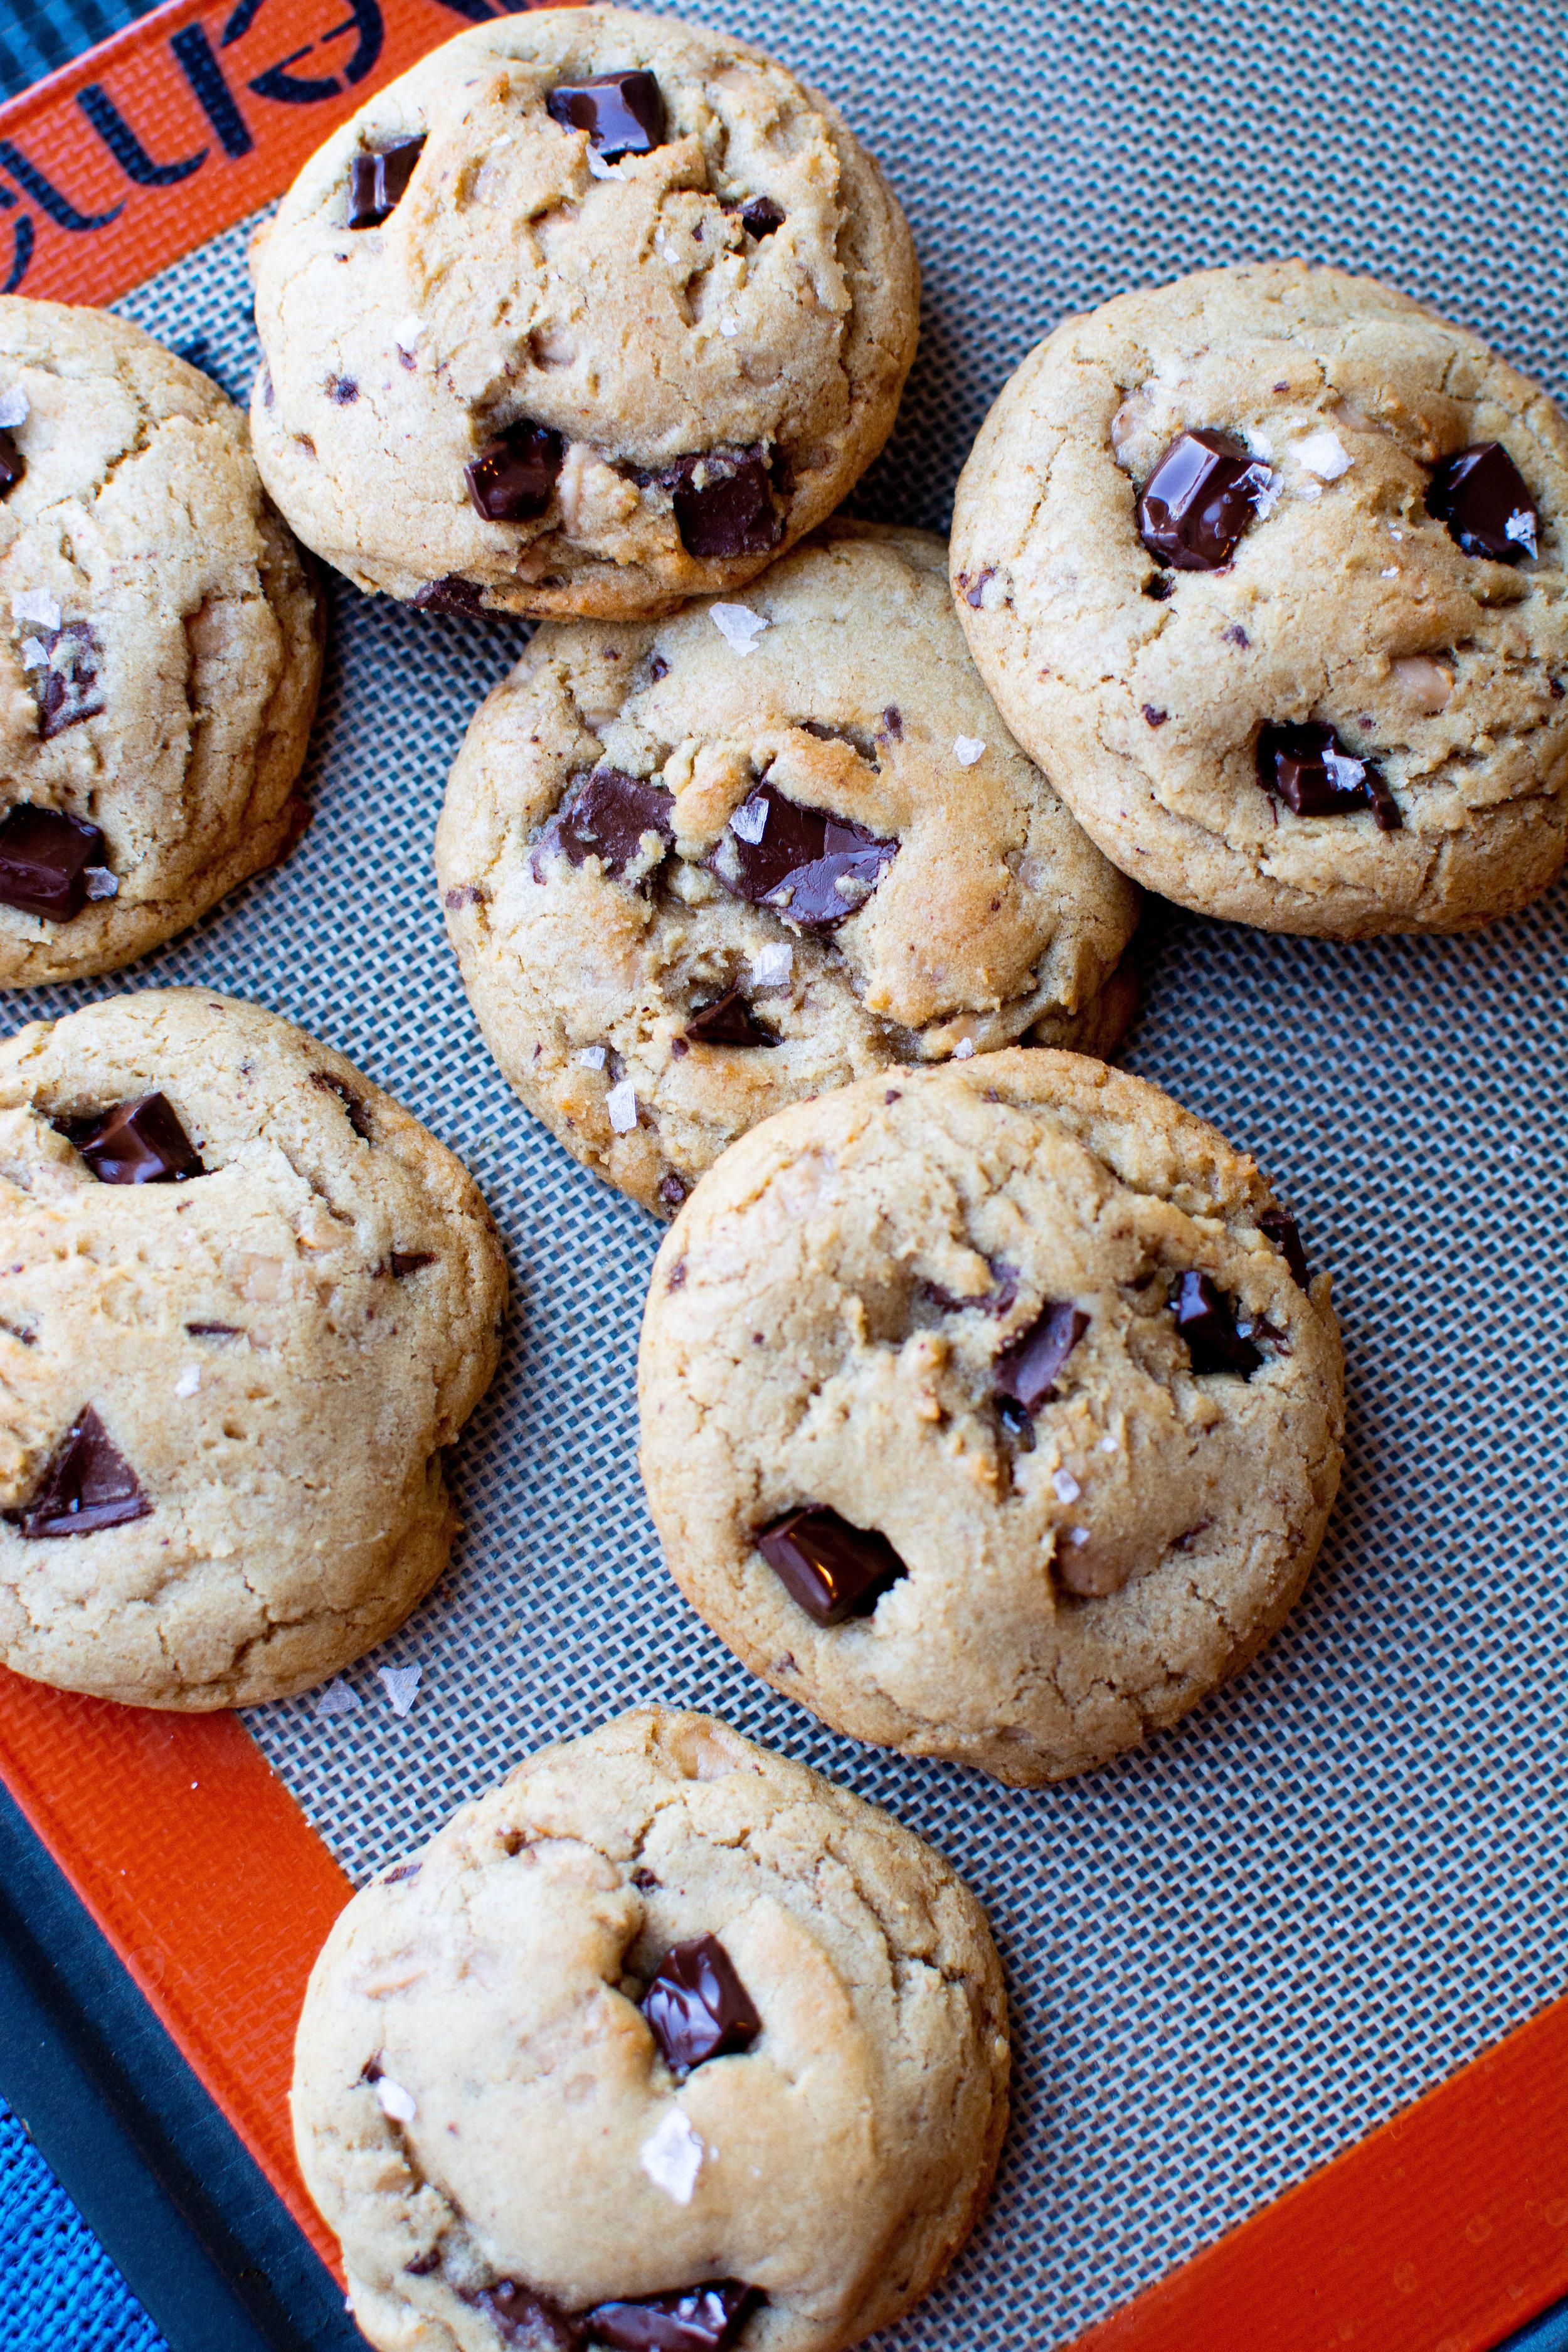 Brown Butter Toffee Cookies